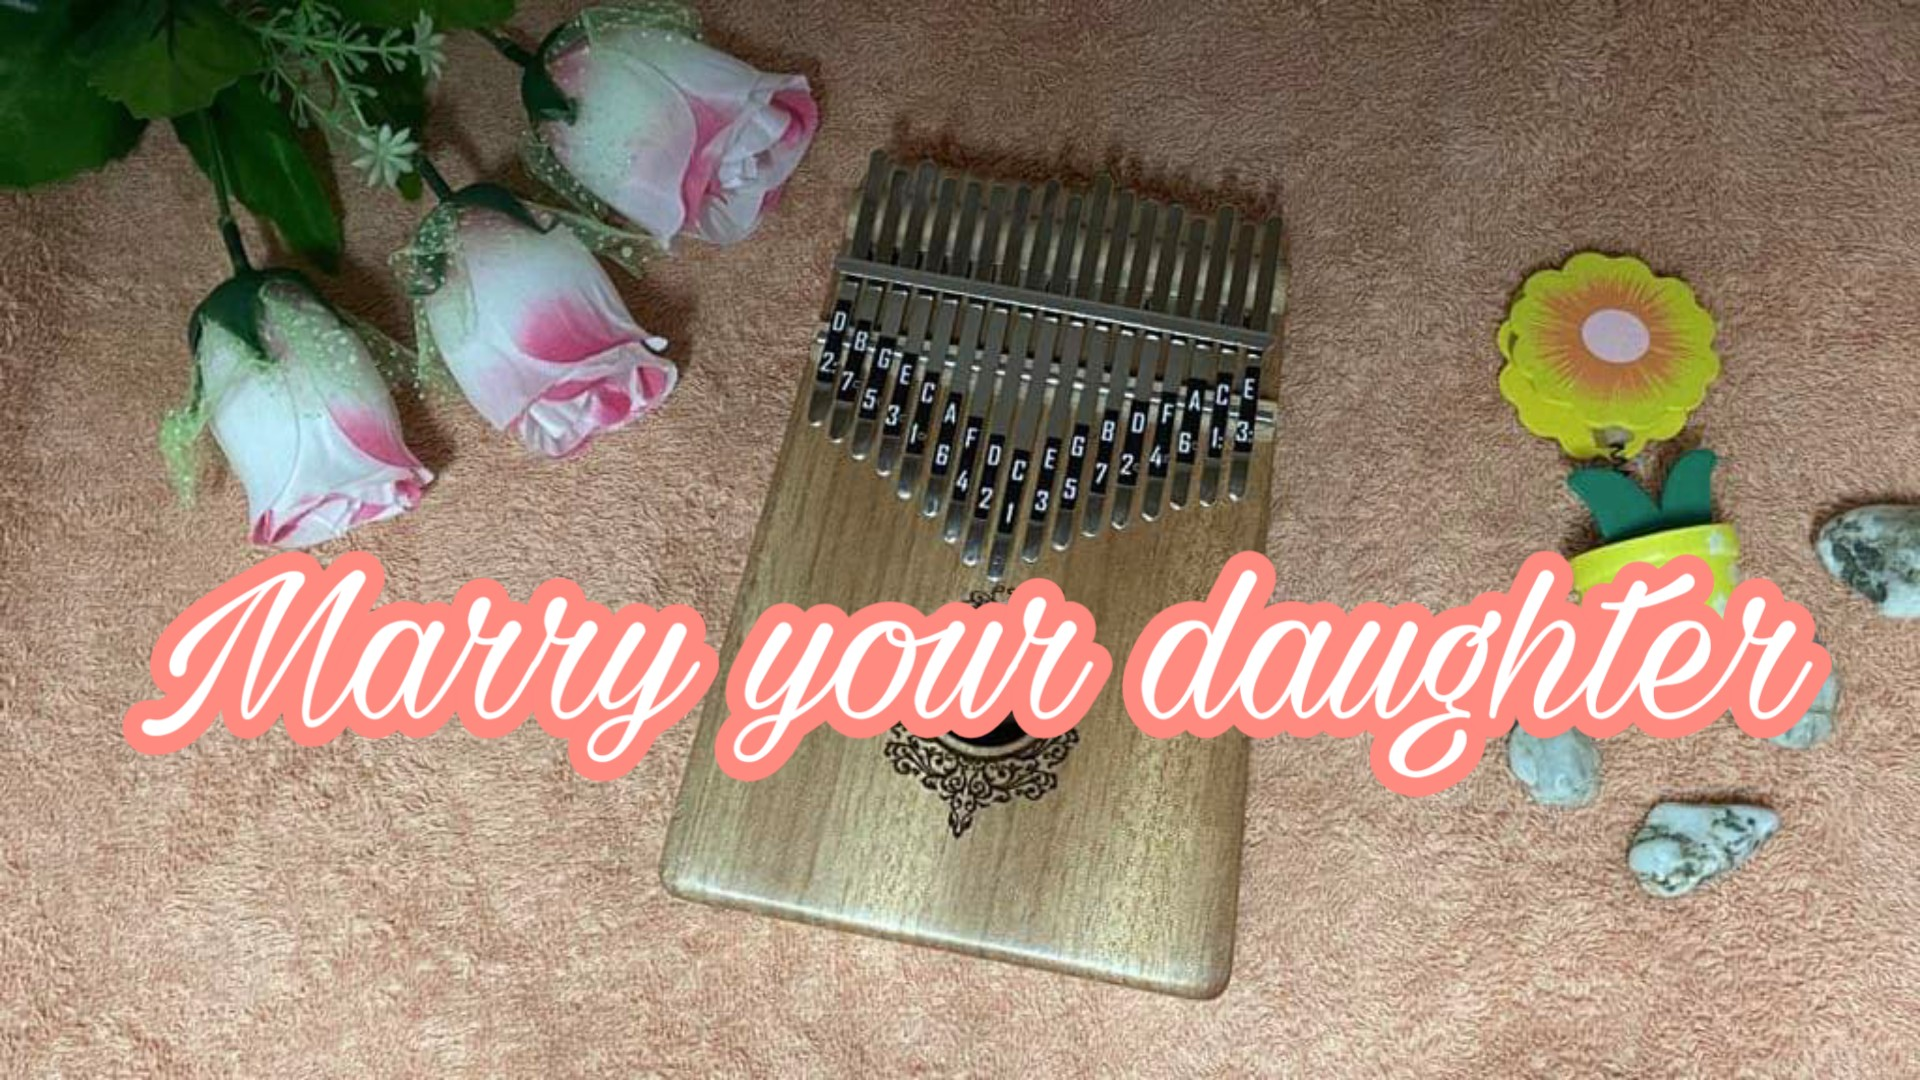 PicsArt_02-18-11.11.491 Marry your daughter